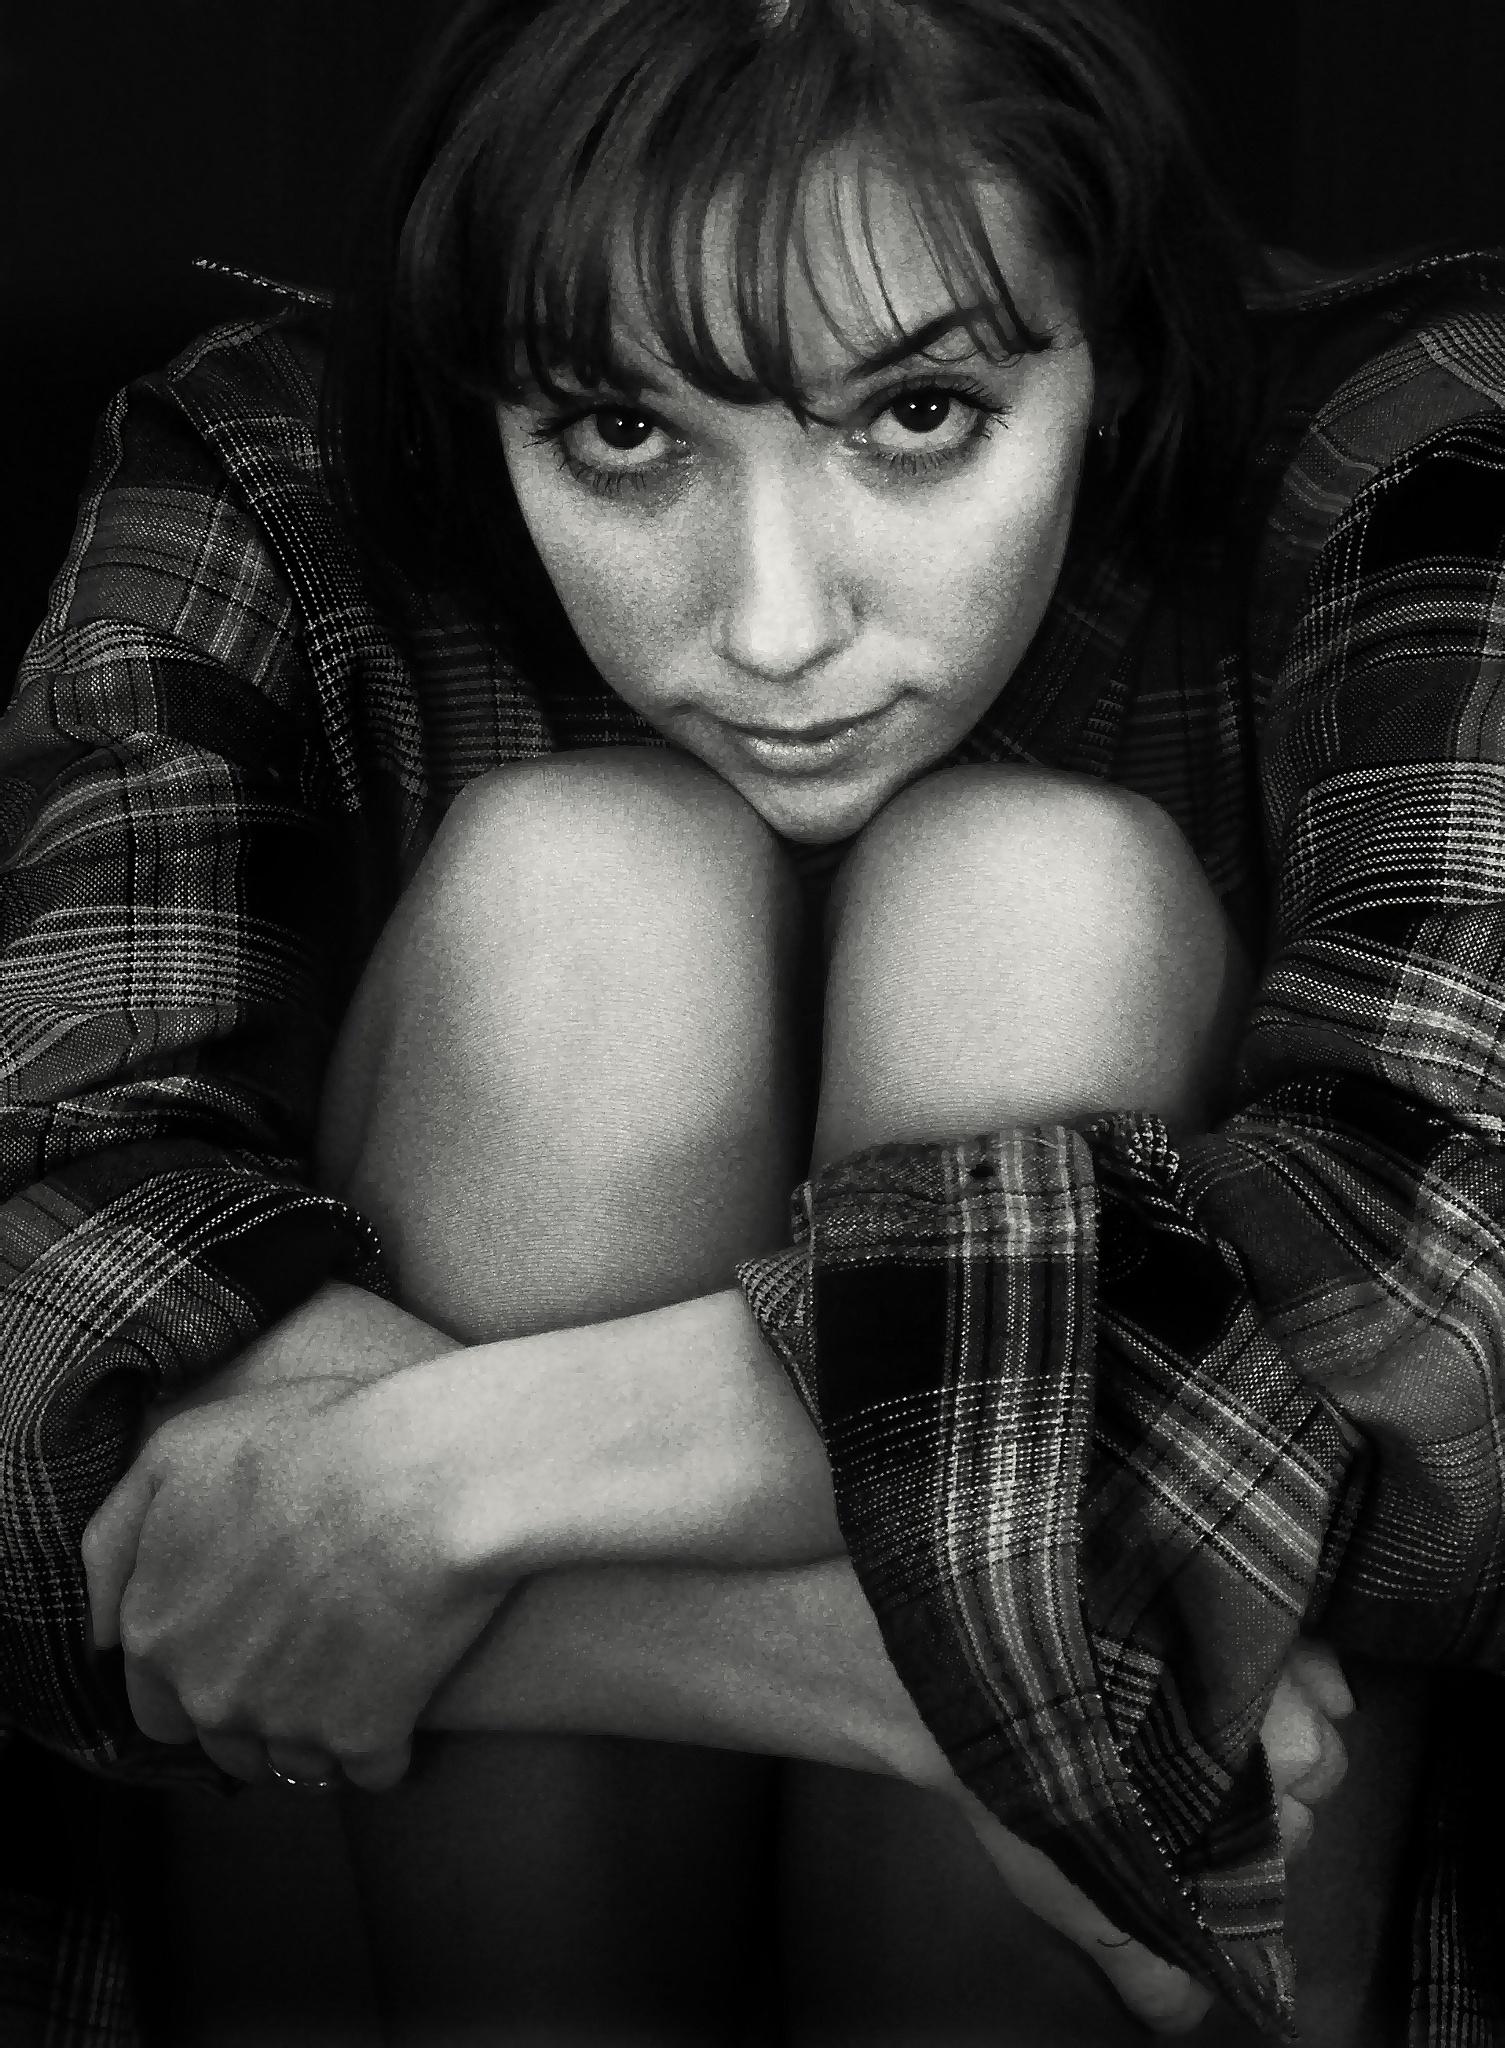 Olga S. by Сергей Юрьев